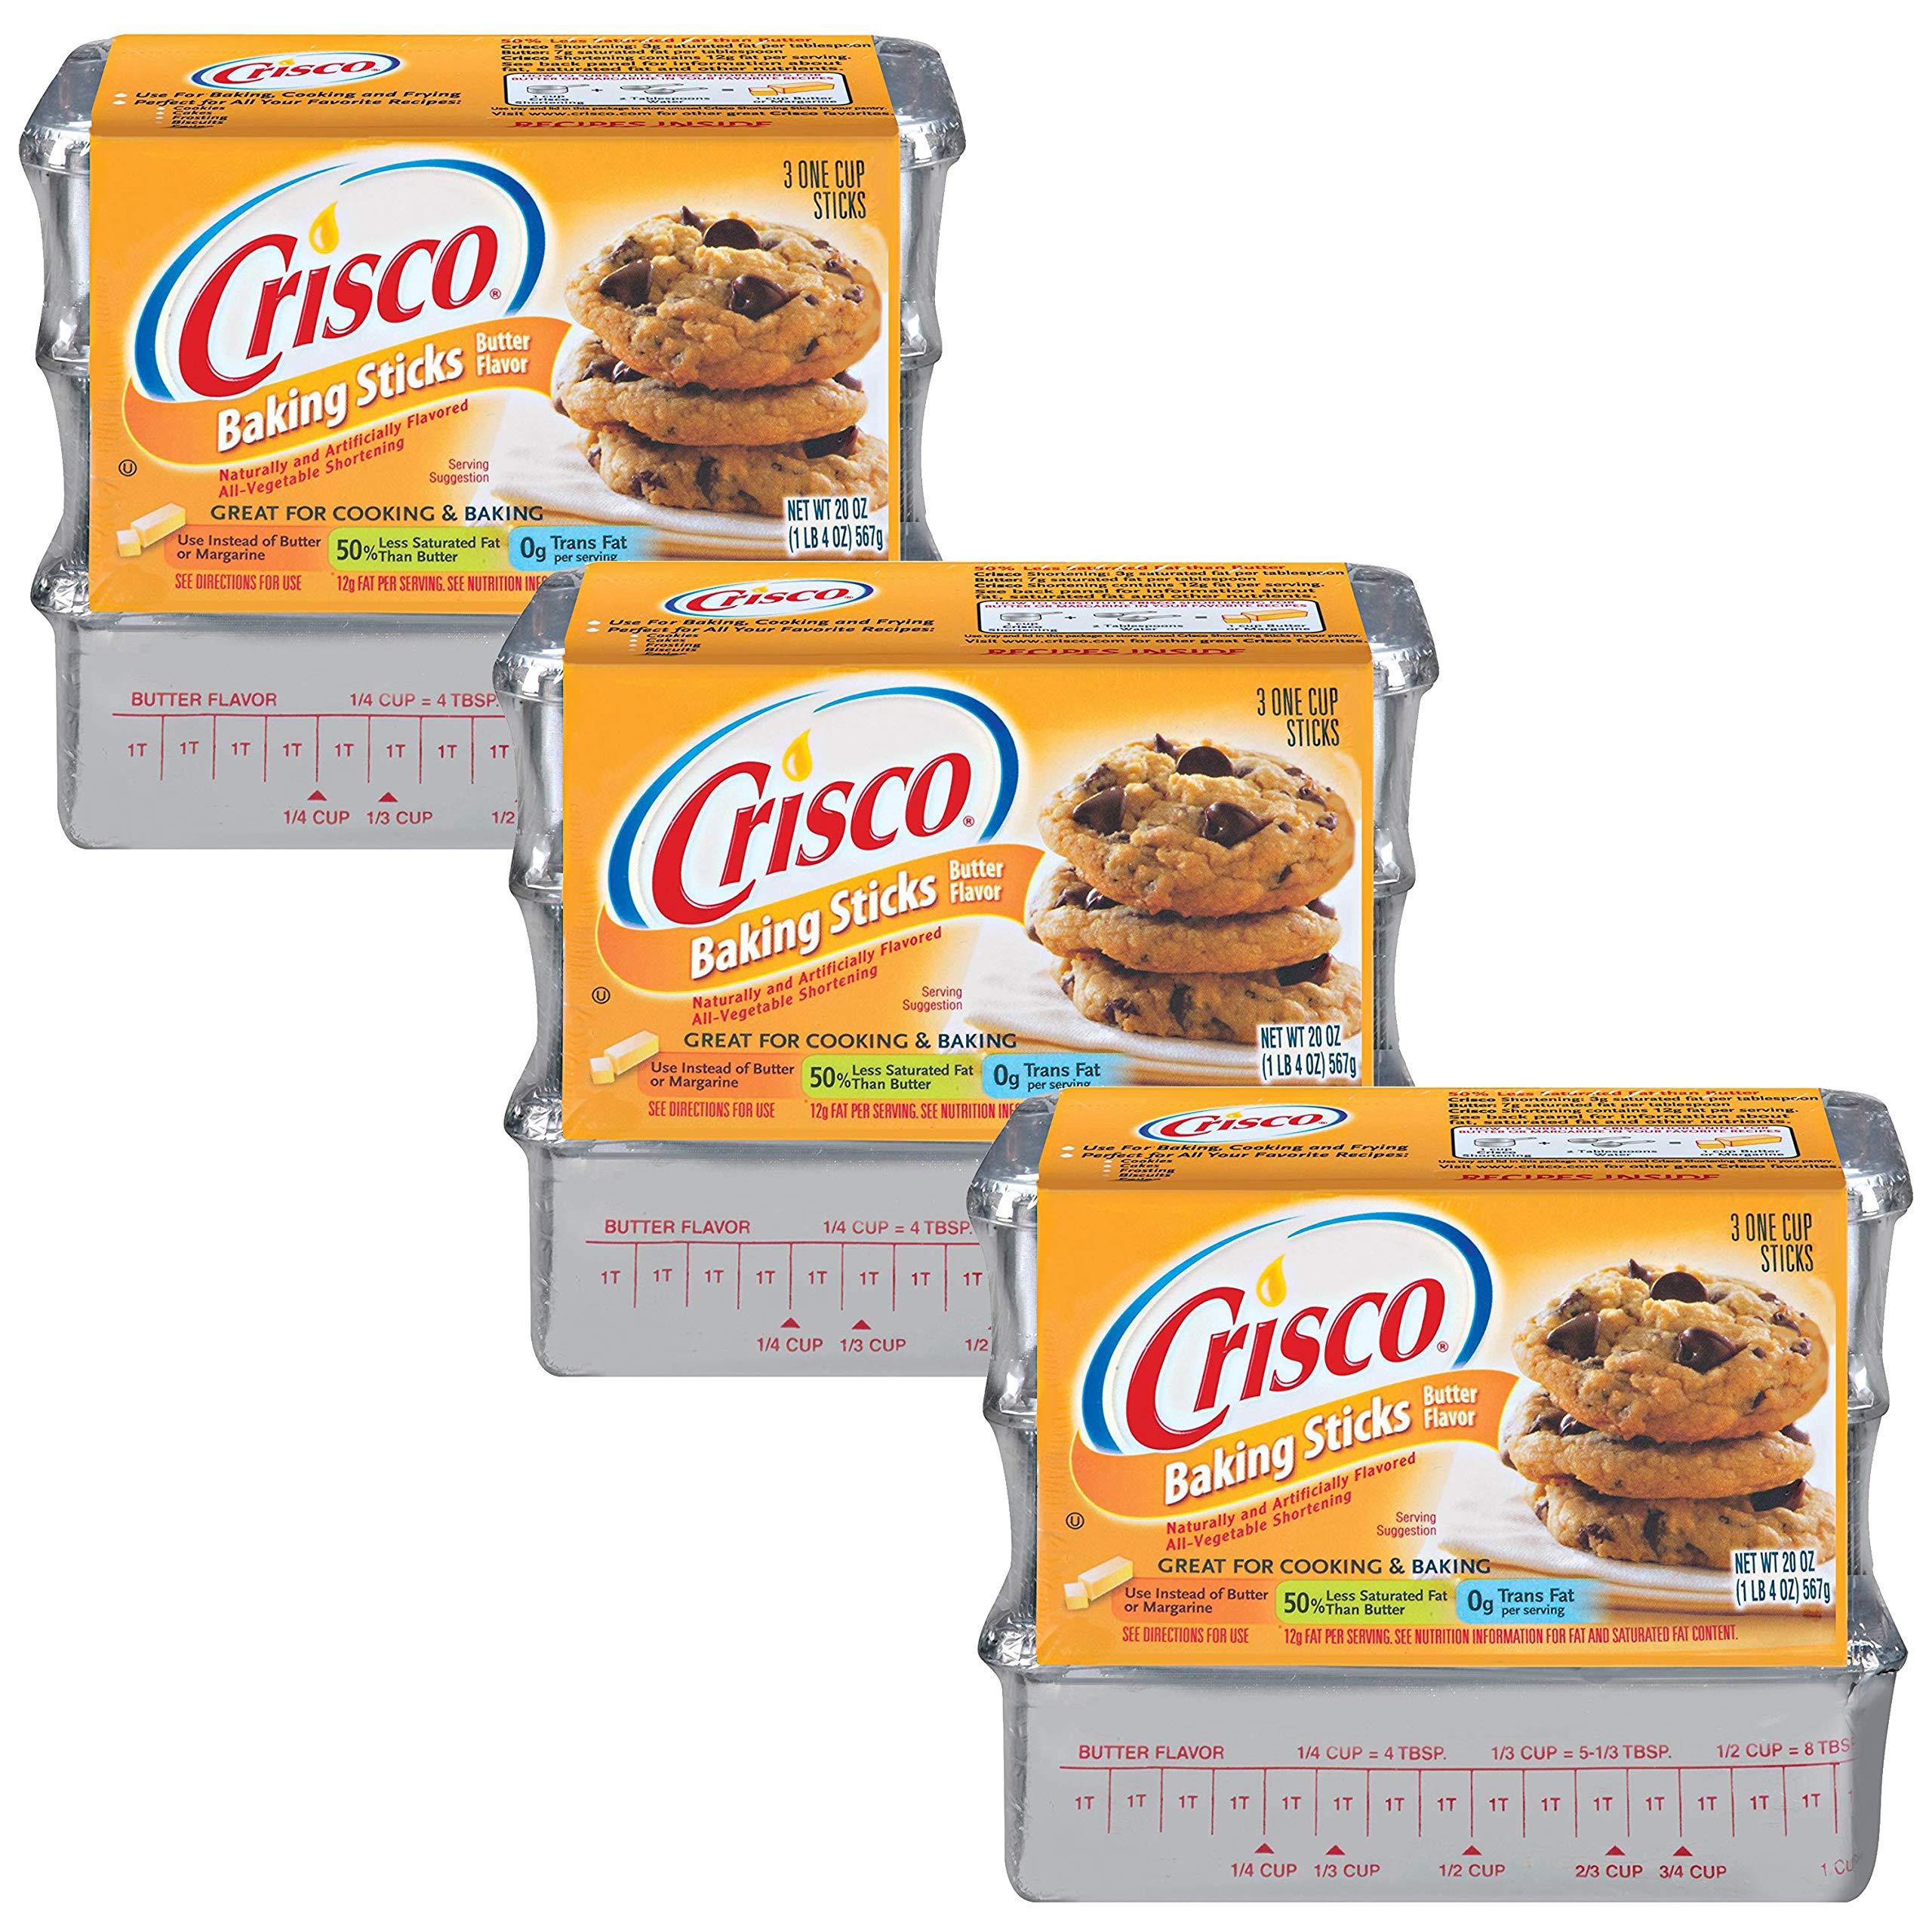 Butter Flavored Crisco Shortening Sticks(3 packages of 3 sticks each) by Crisco Butter Flavored Shortening Sticks